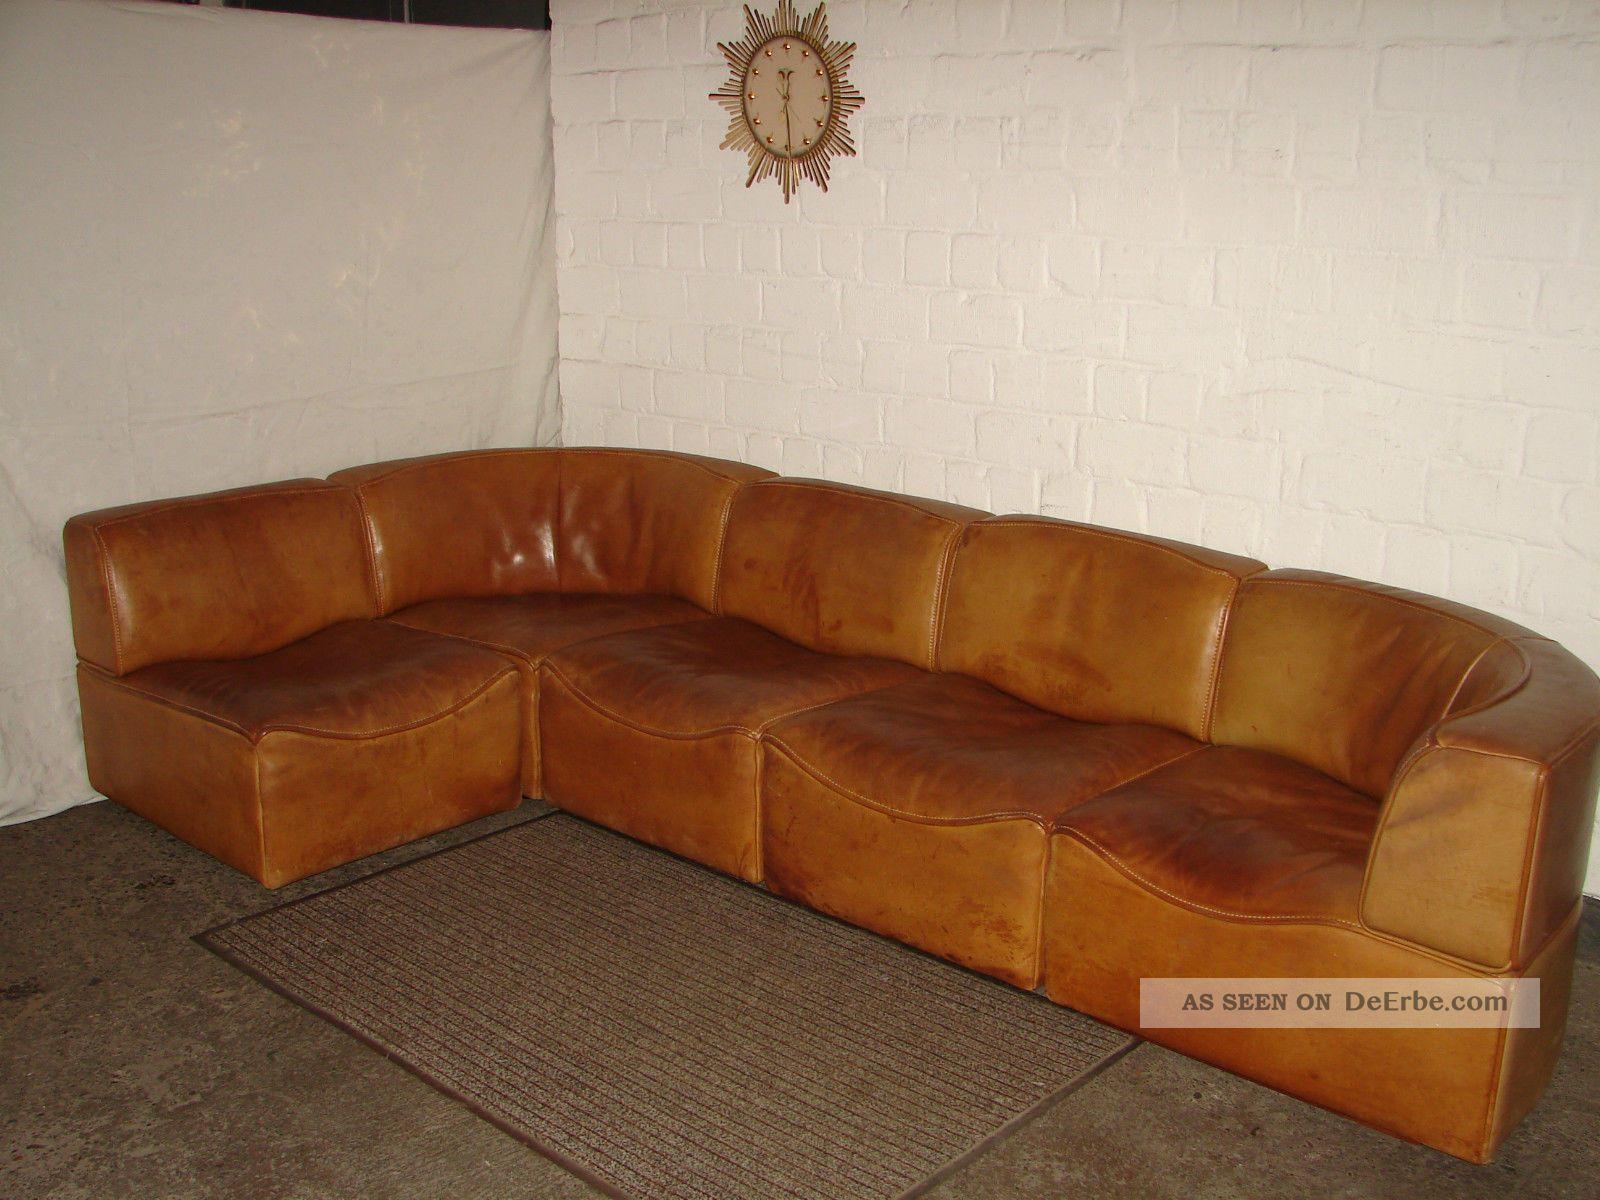 De Sede Ds - 15 Modular Leder Sofa Sessel Büffelleder Sitzgruppe 1960 1970 Couch 1960-1969 Bild